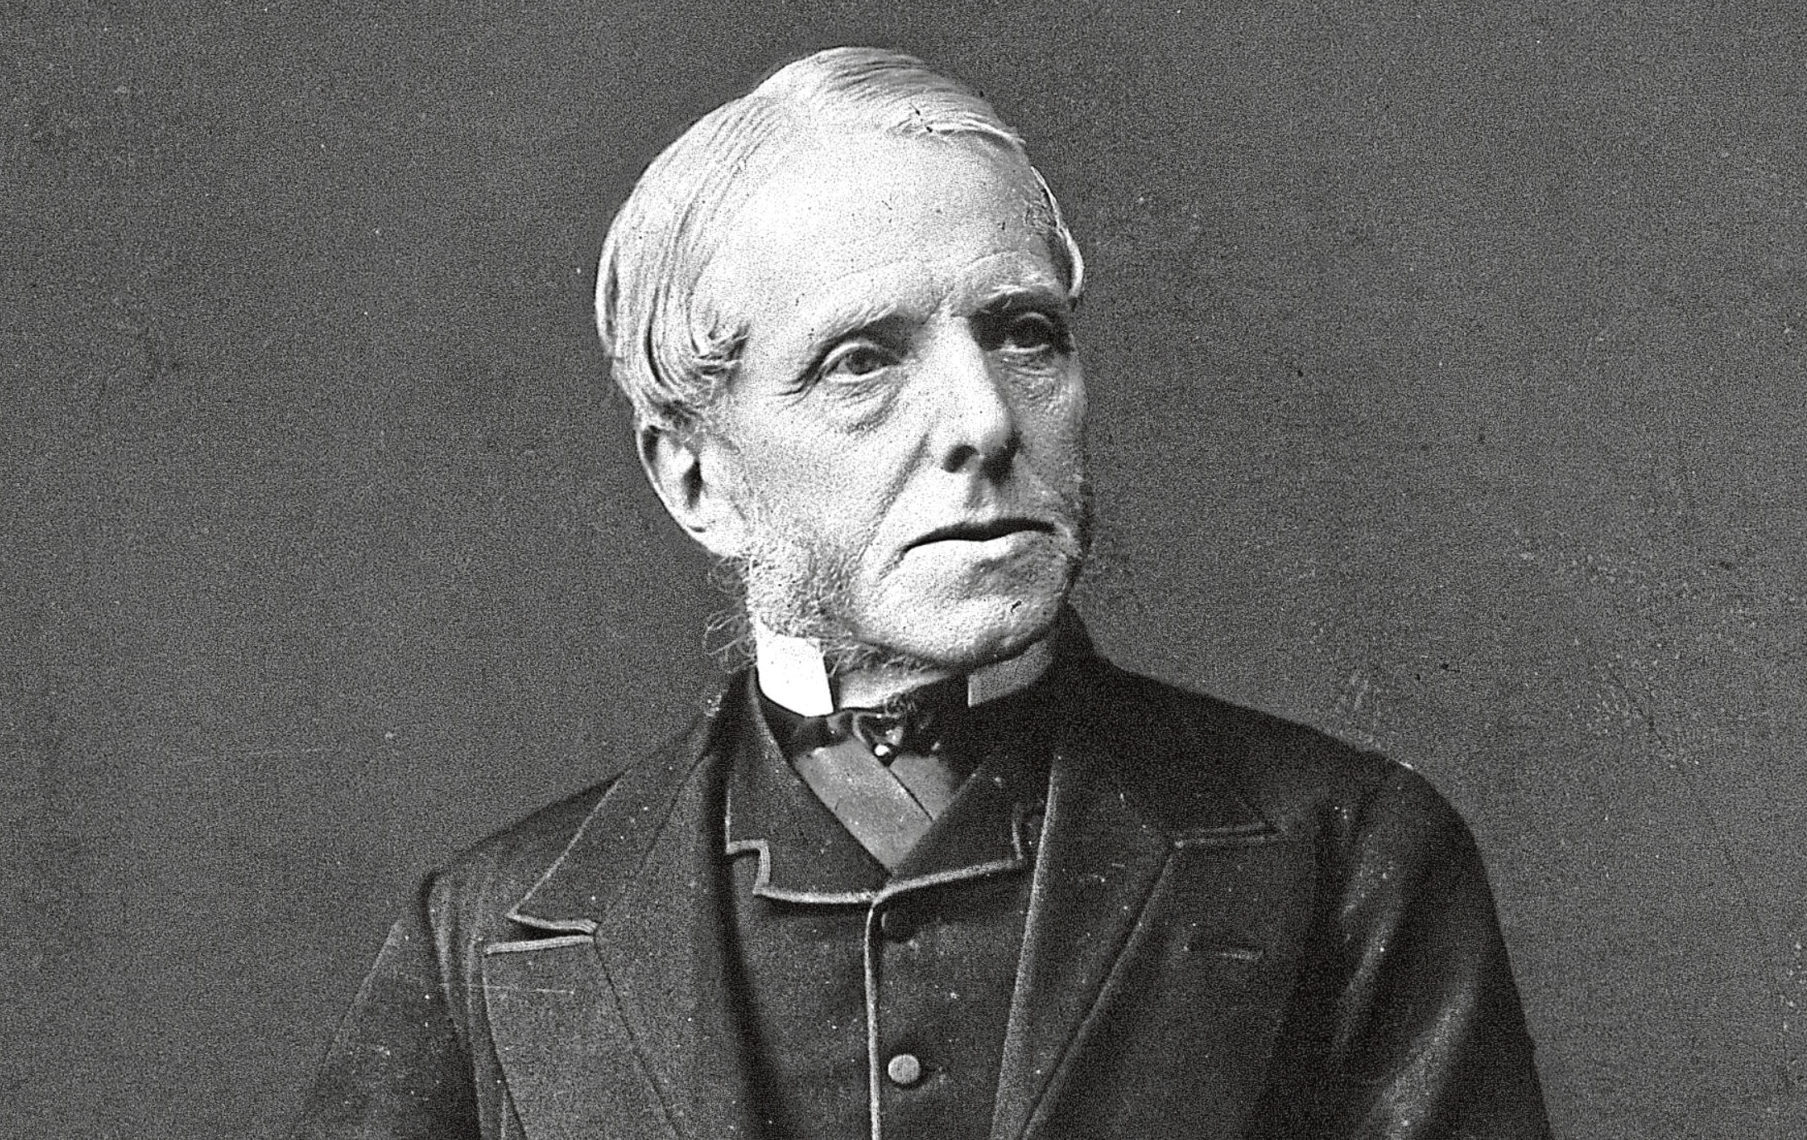 Sir Henry Duncan Littlejohn (Wellcome Library, London)